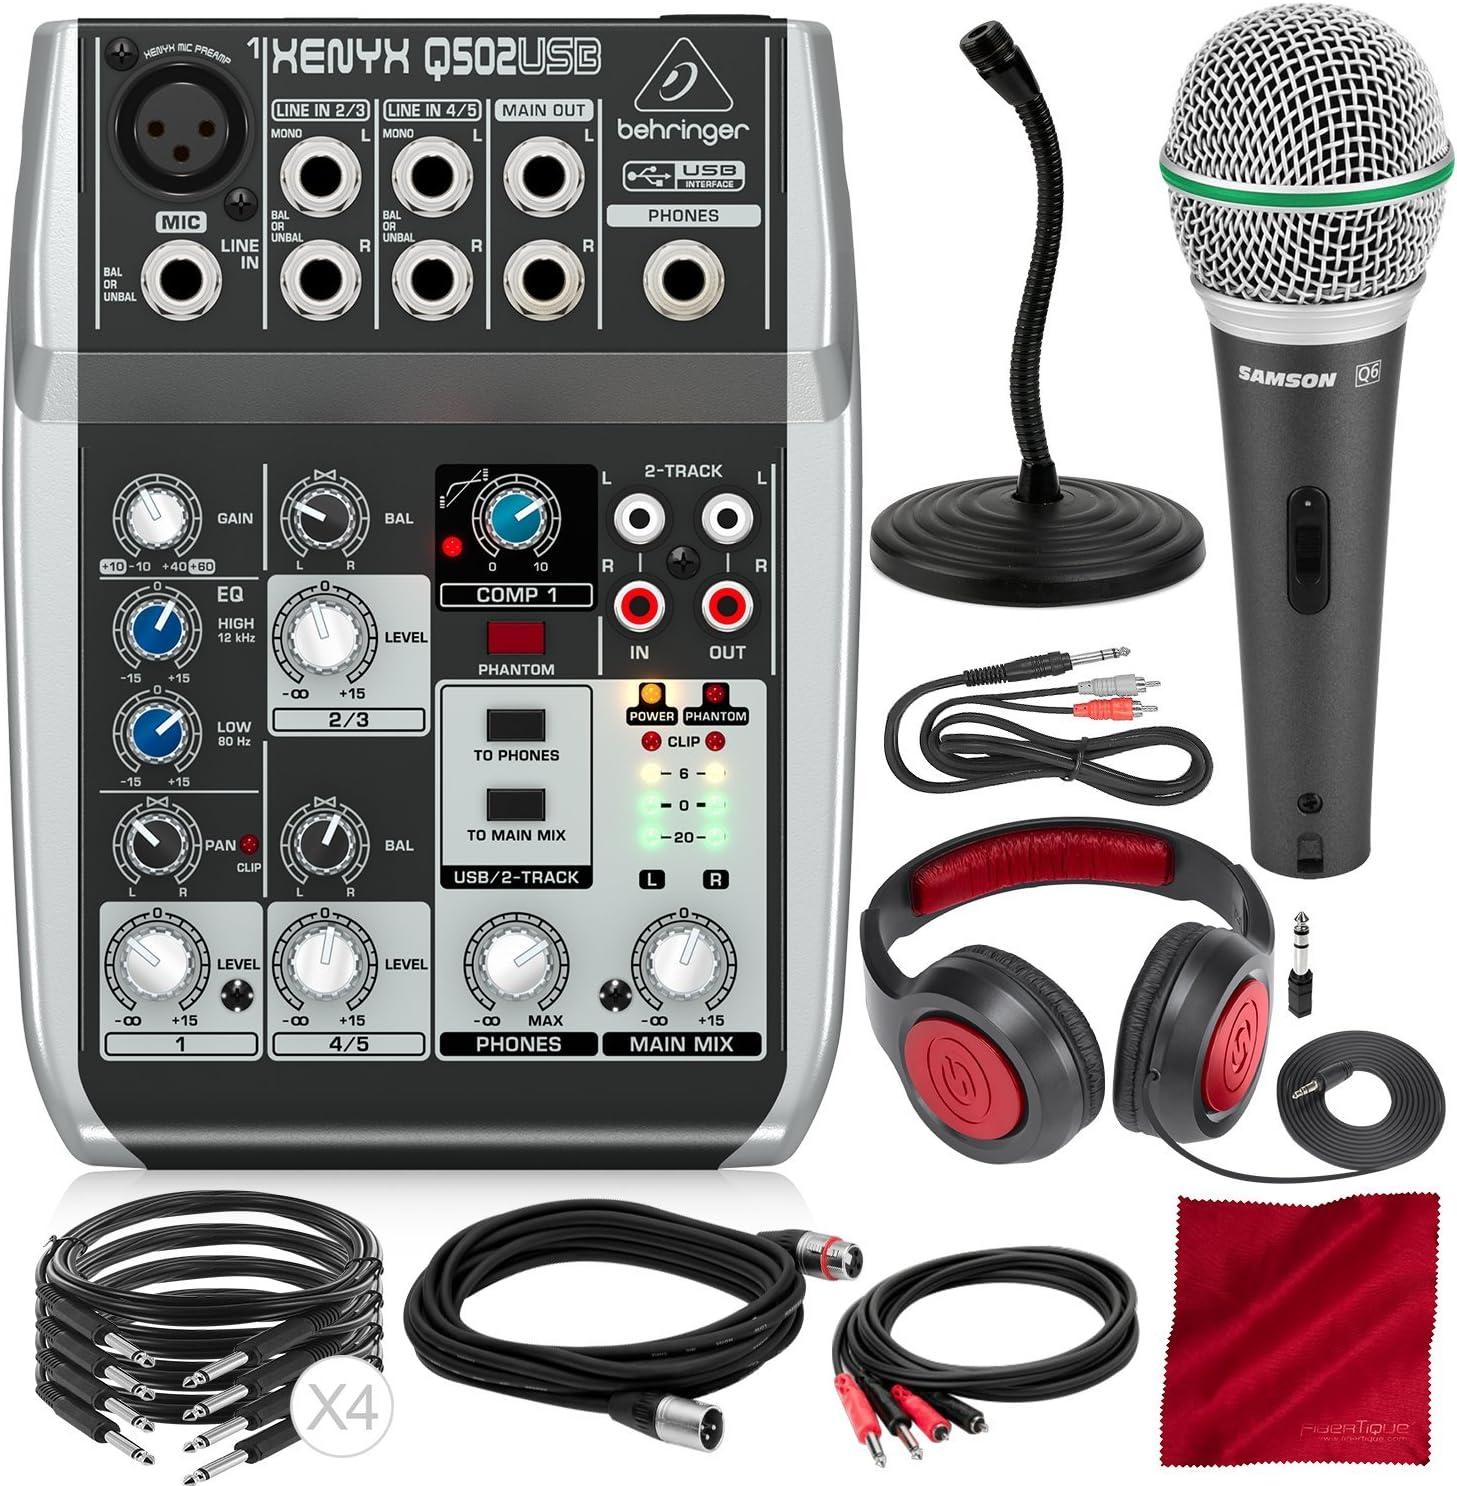 Closed-Back Headphones Behringer Xenyx Q502USB Premium 5-Input 2-Bus Mixer with Dynamic Microphone and Platinum Bundle